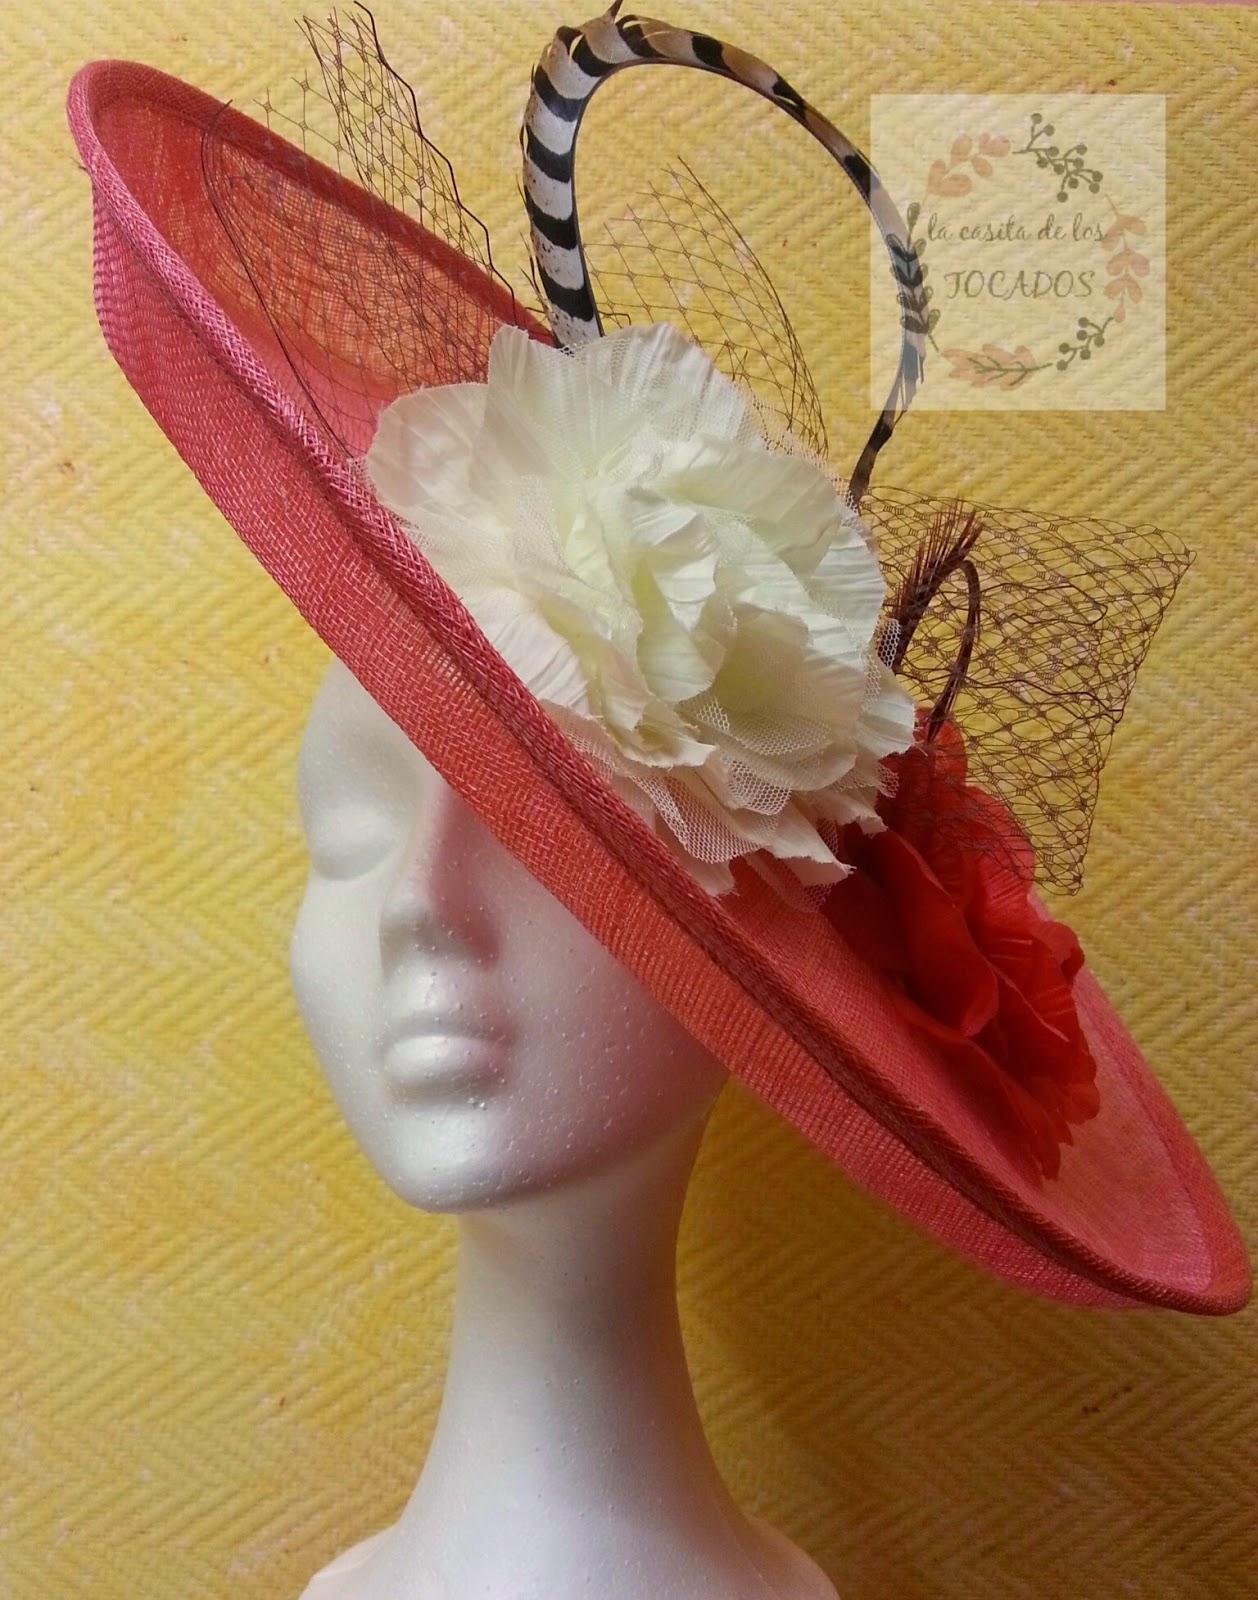 pamela en color coral con plumas y velo para boda de mañana realizado por encargo